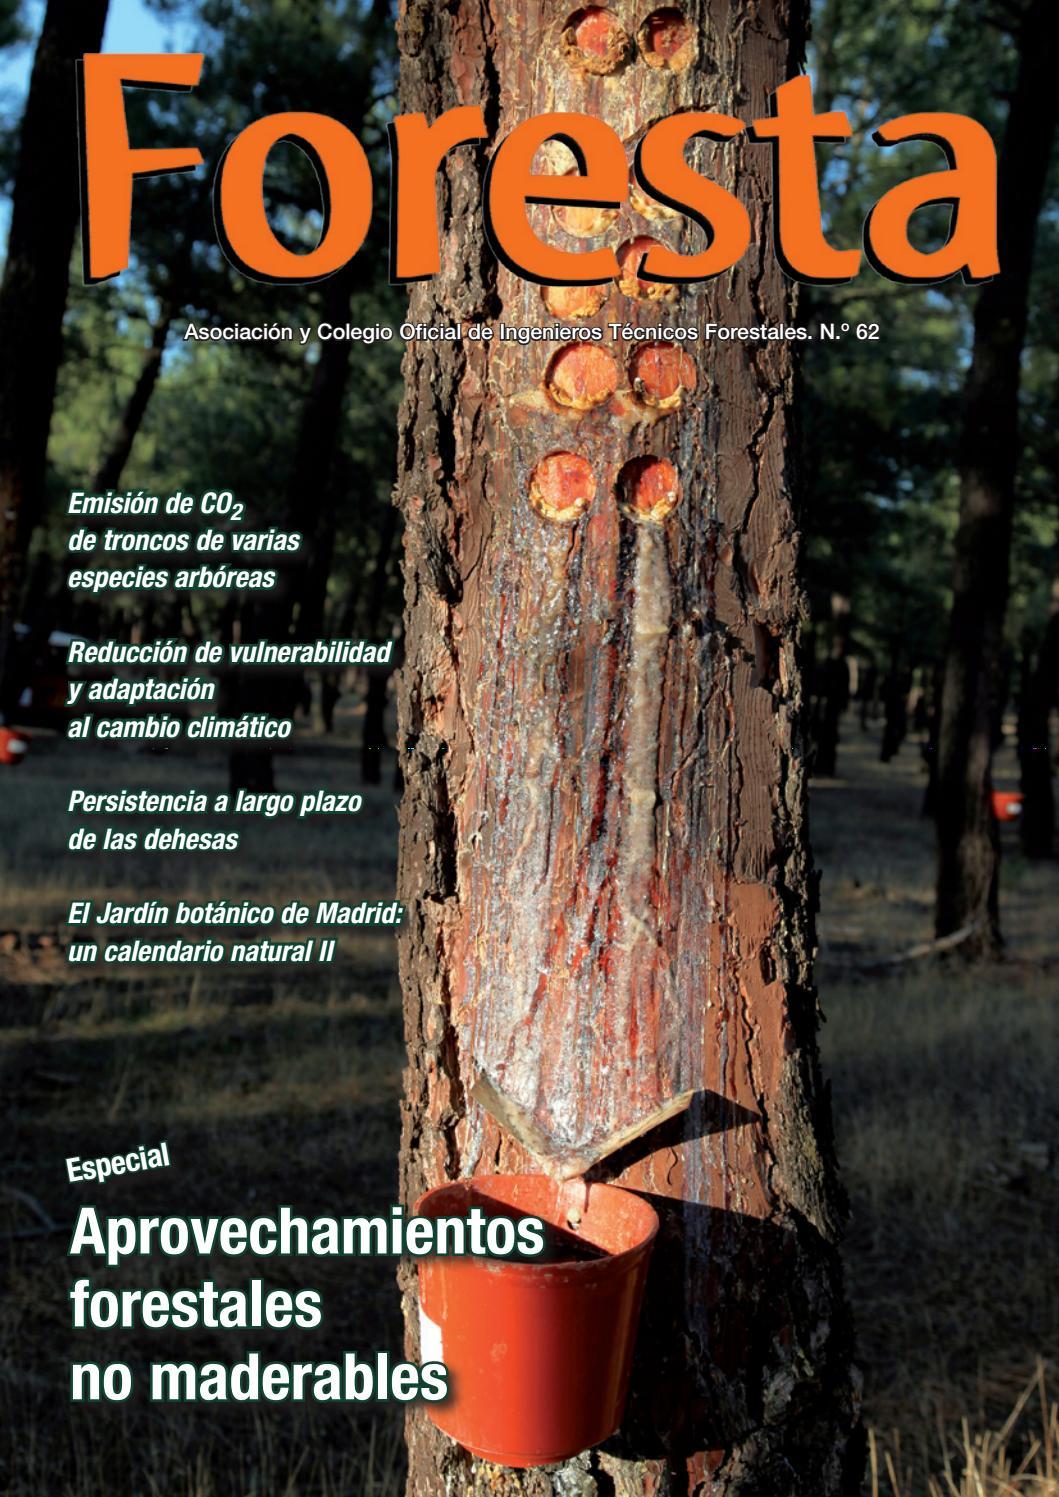 Revista Foresta nº 62 by Foresta - issuu